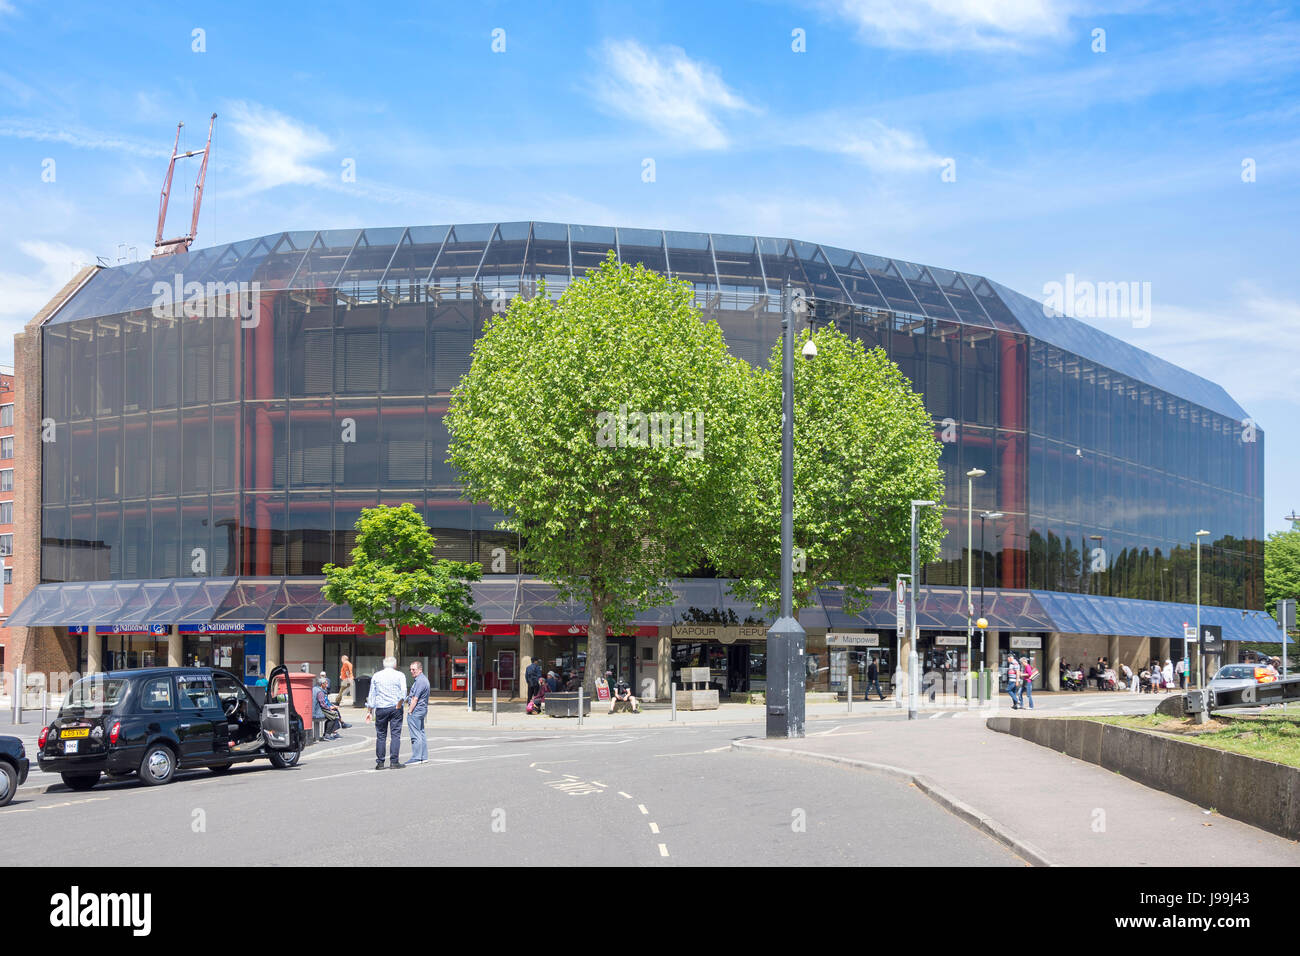 The Meads Shopping Centre, Eastmead, Farnborough, Hampshire, England, United Kingdom - Stock Image